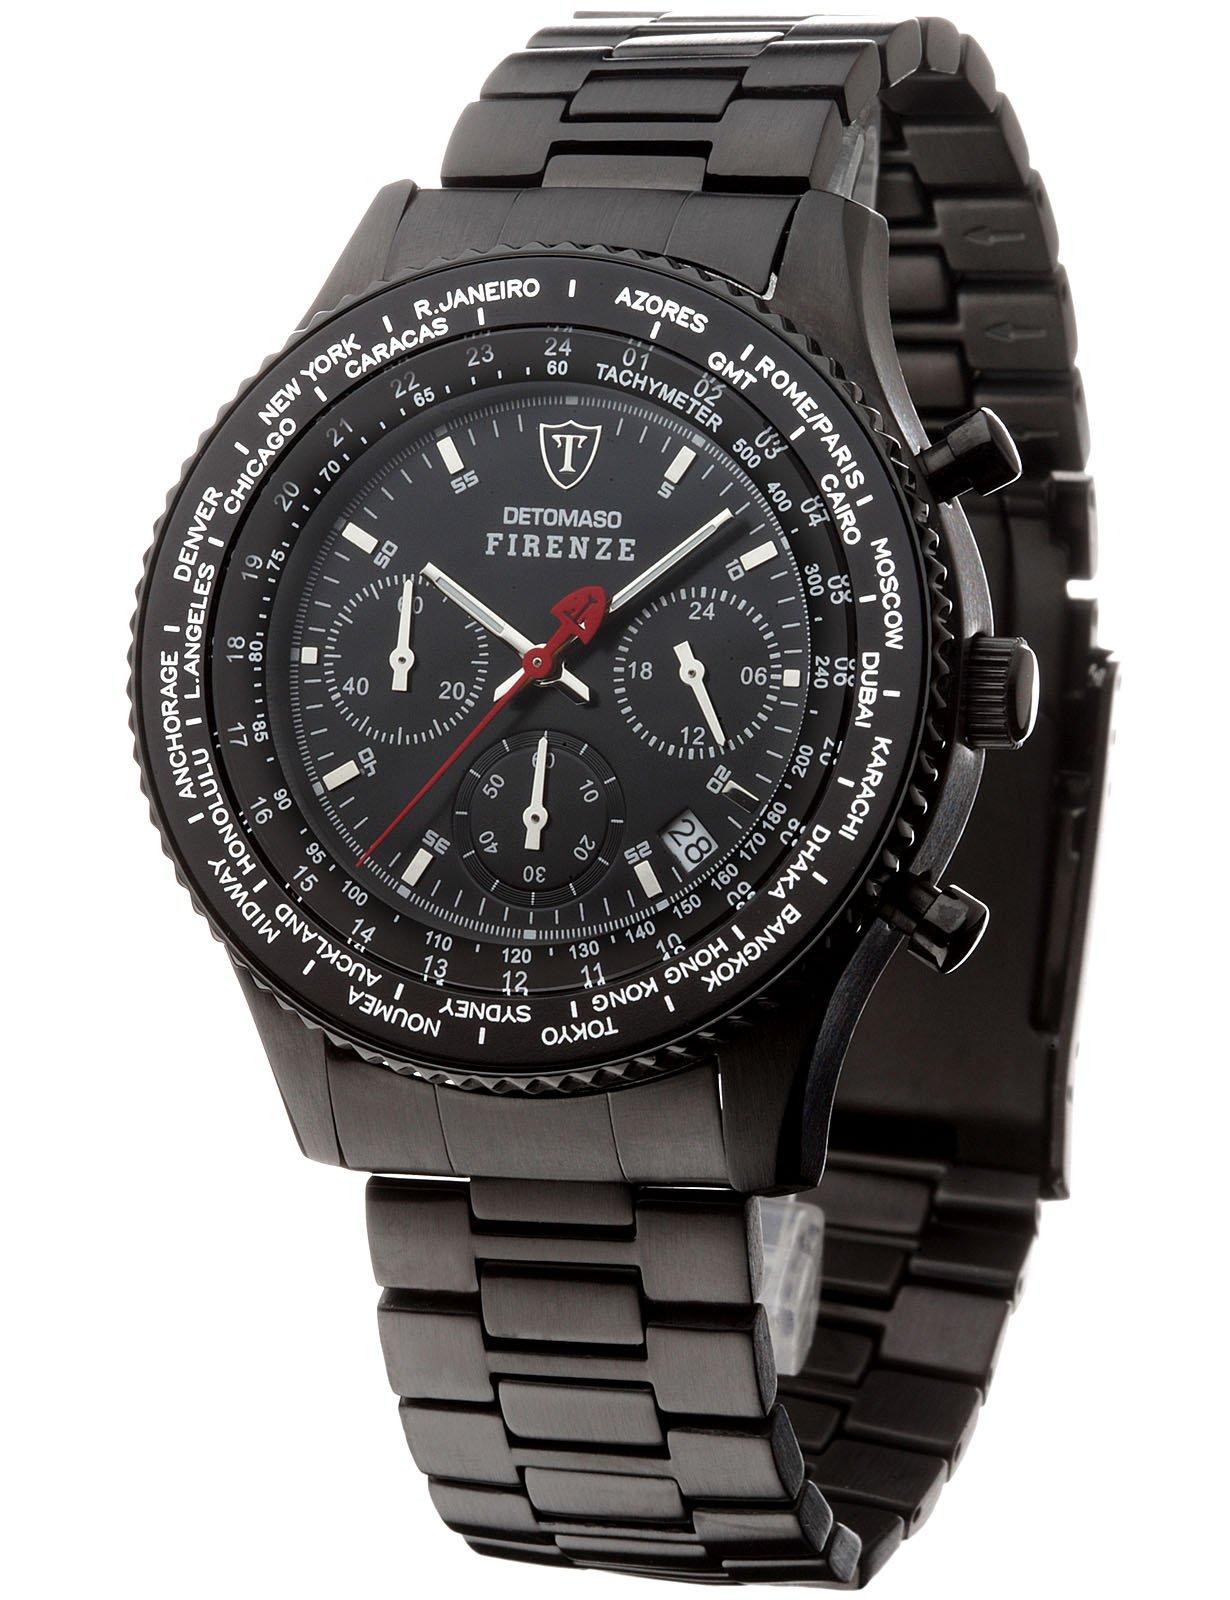 Reloj de cuarzo Detomazo Firense para caballero, dial beige con pantalla de cronógrafo, pulsera de cuero en color marrón SL1624C-BG